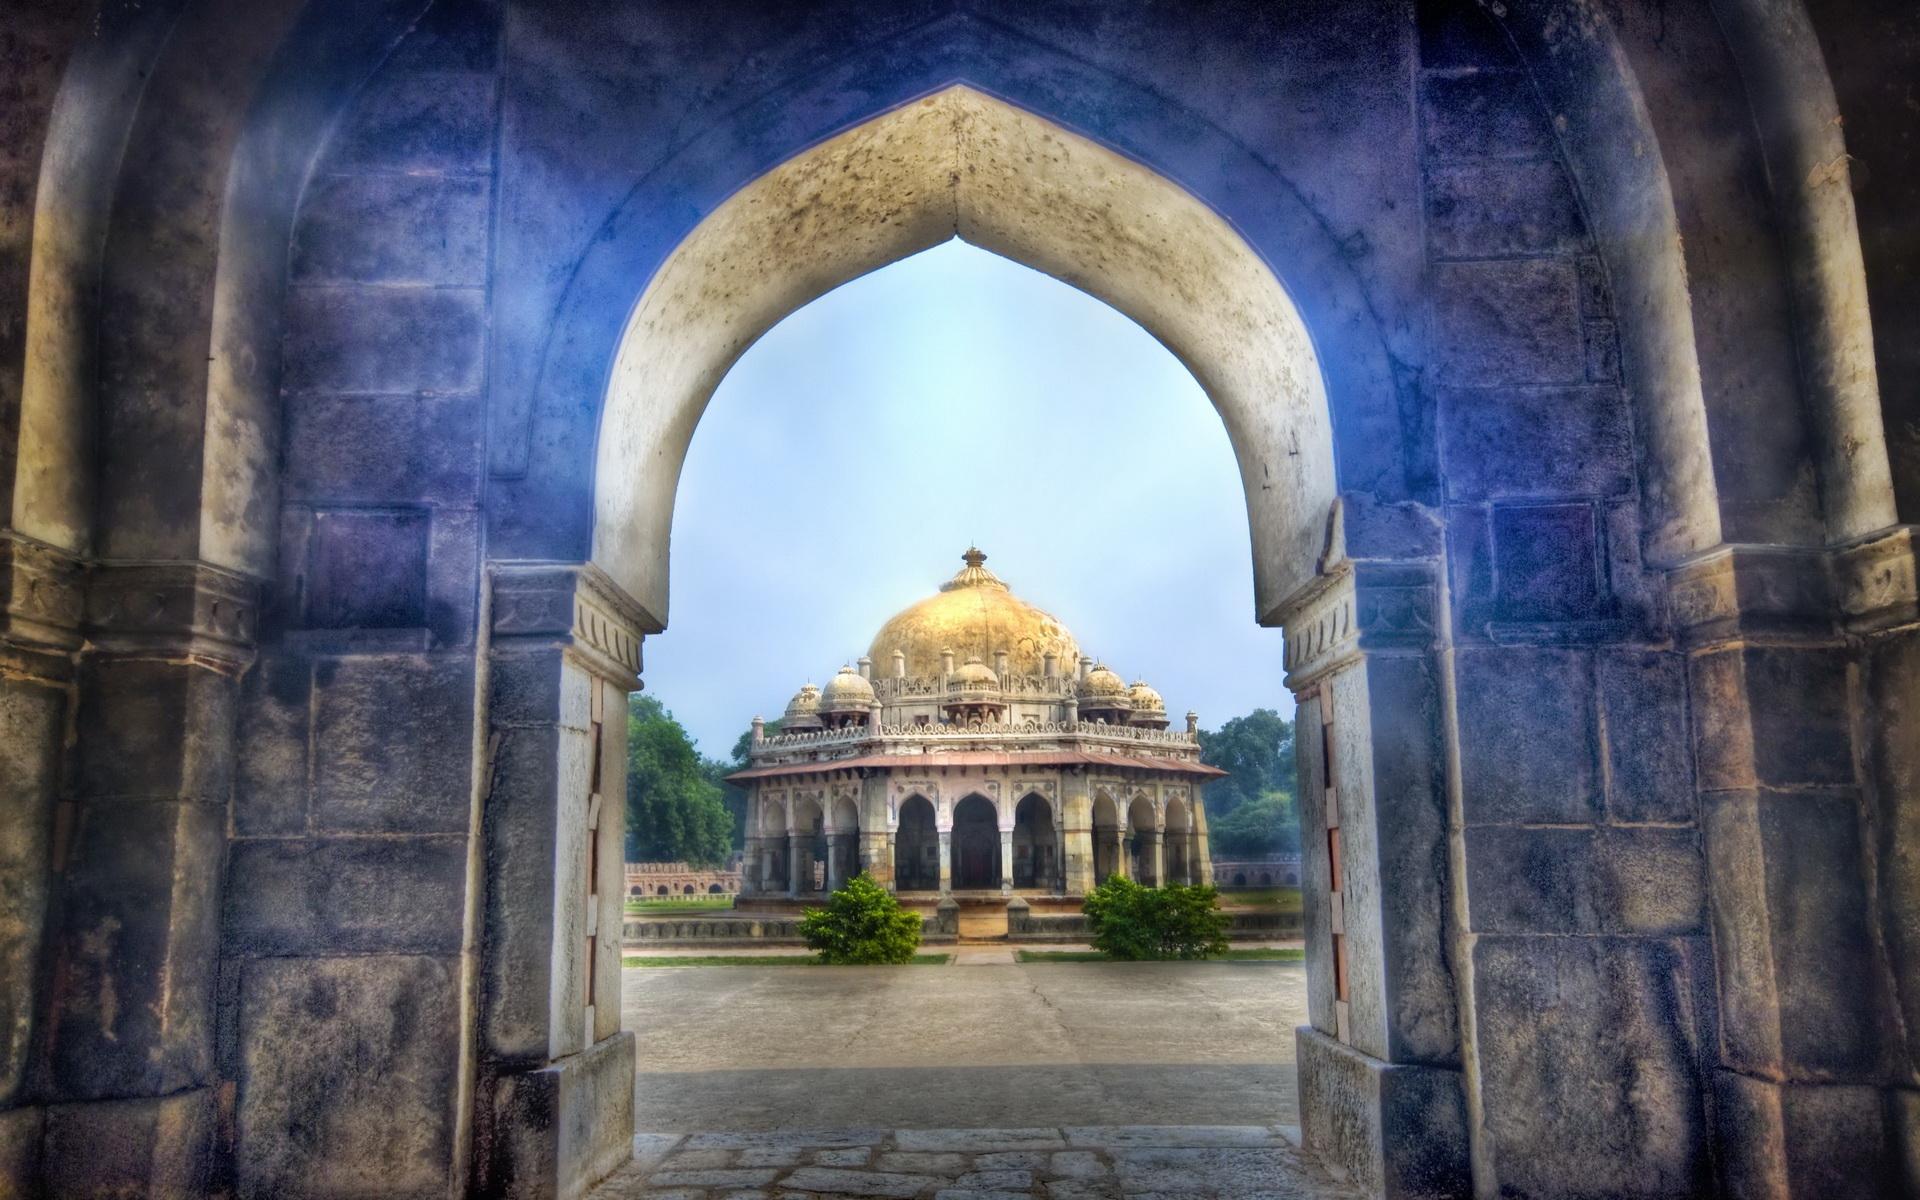 Temple Delhi India Full Hd Wallpaper And Background